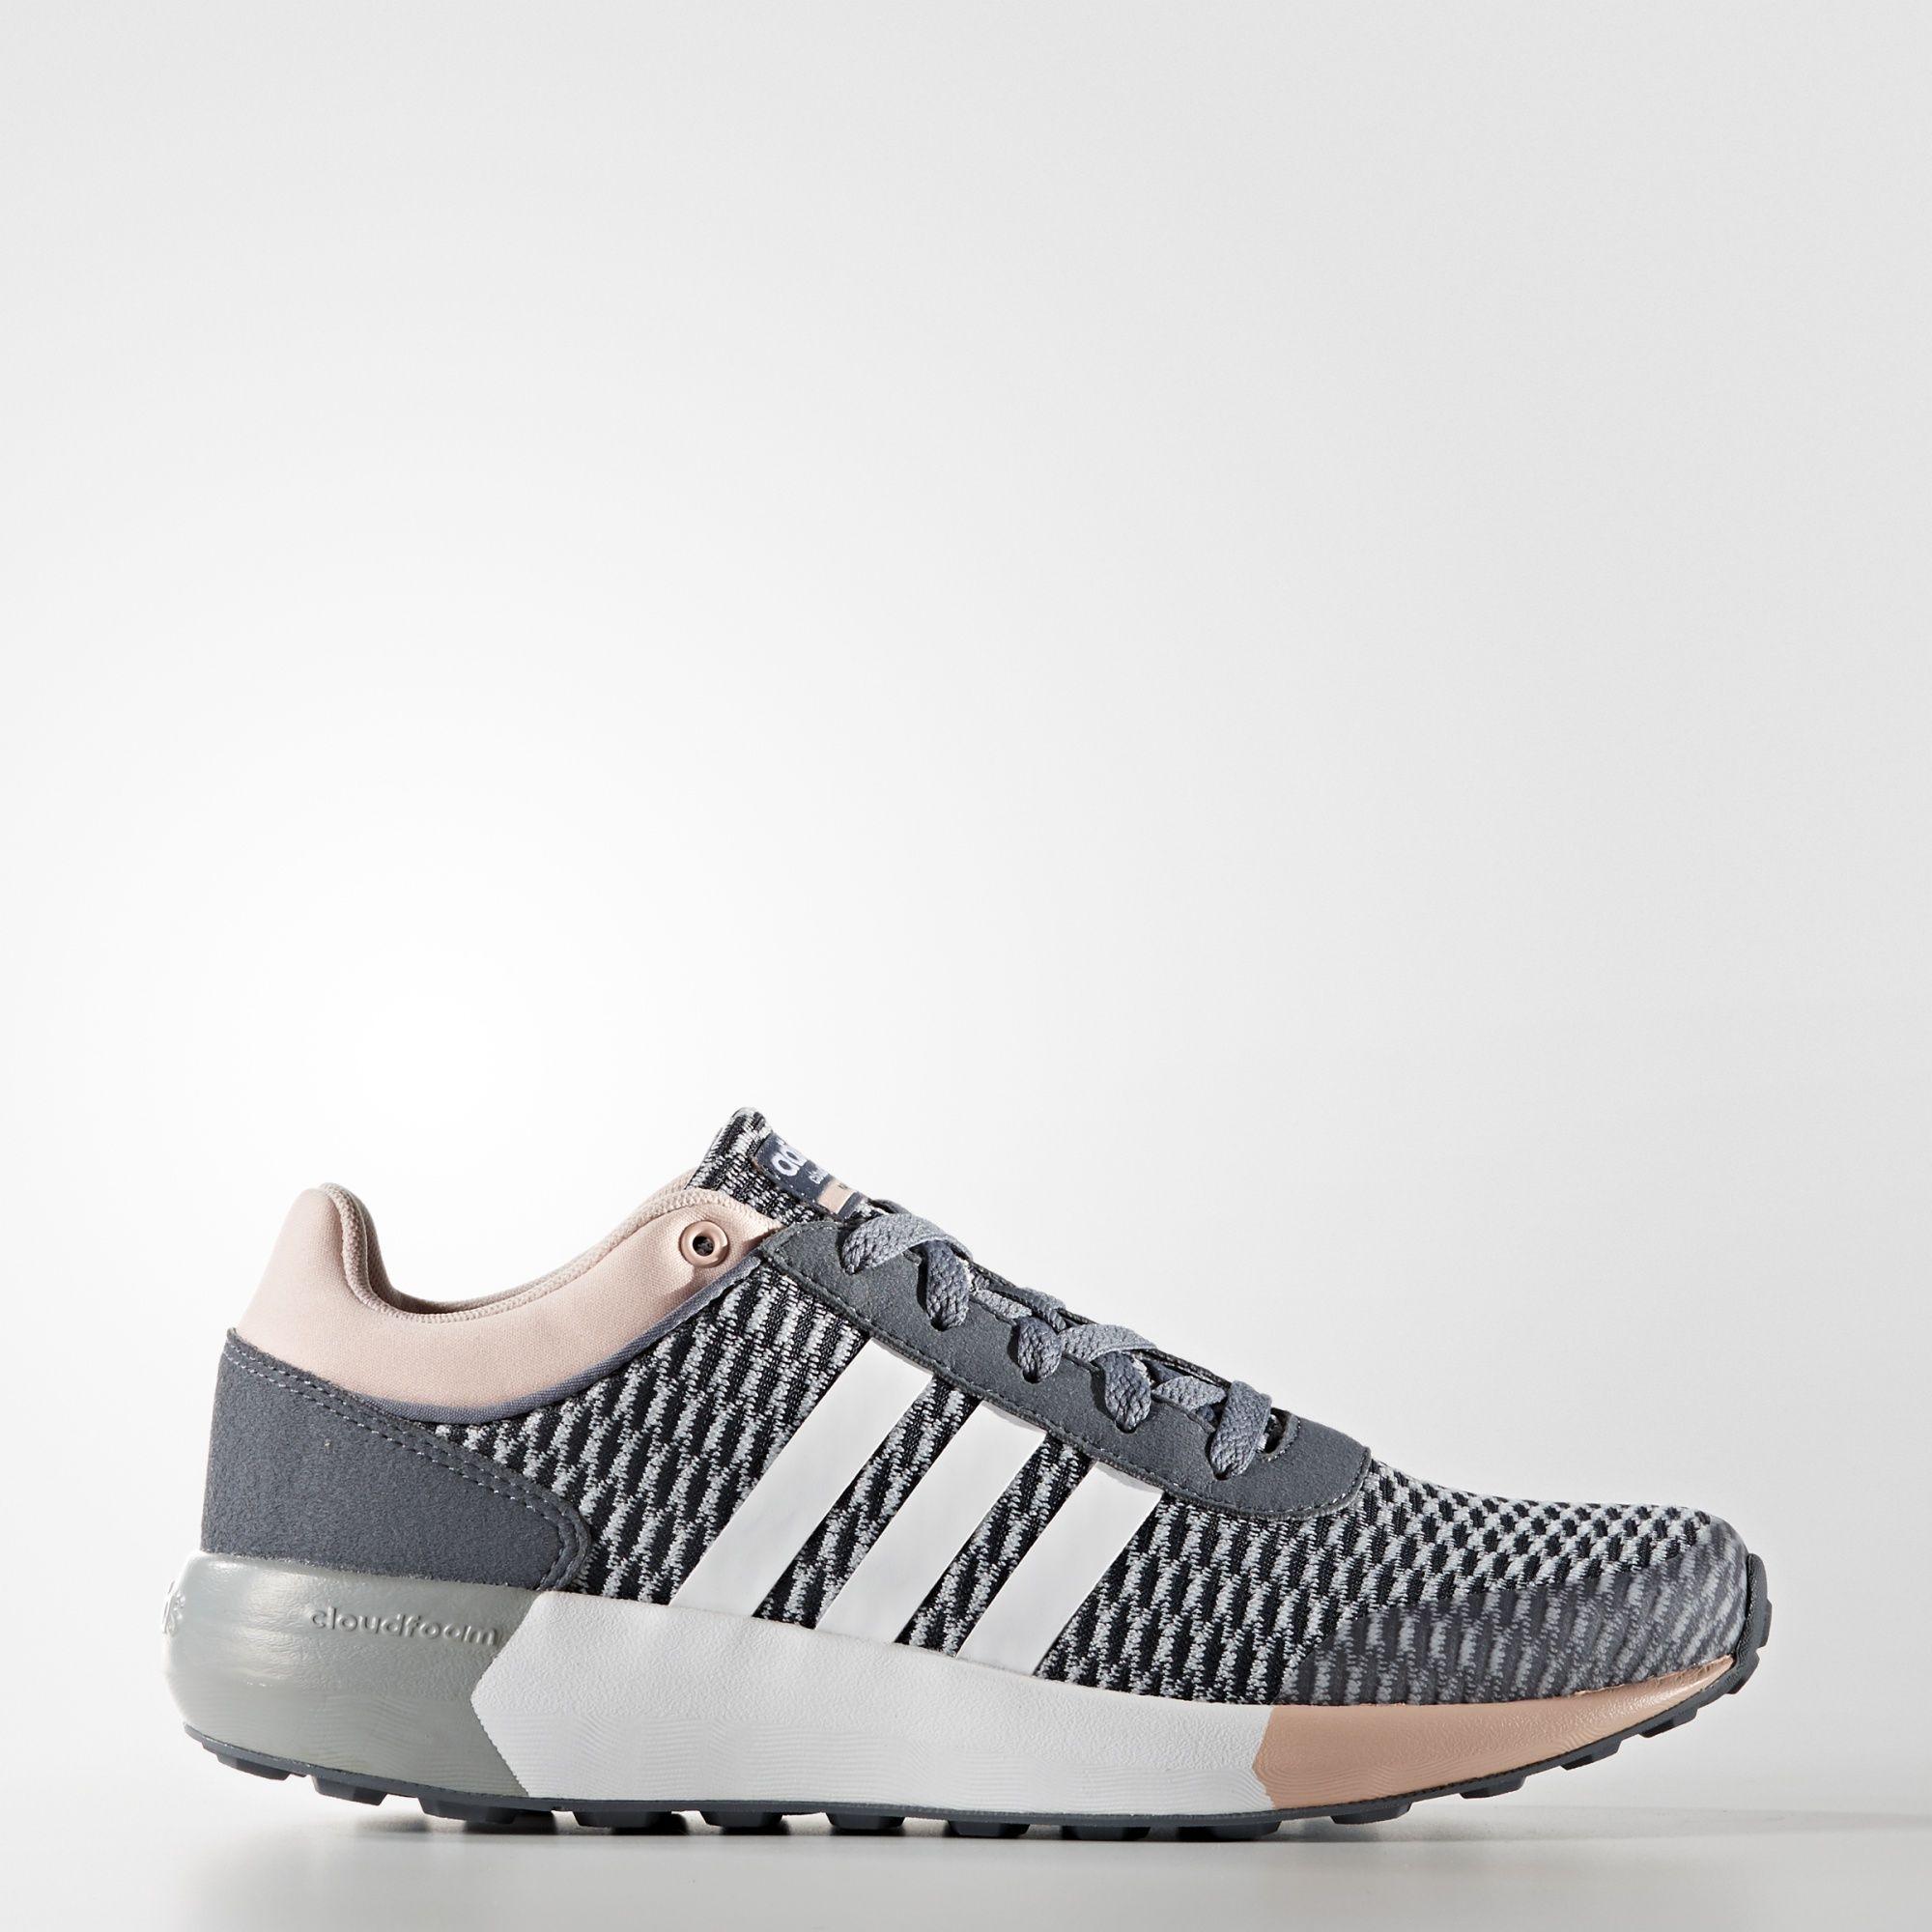 adidas cloudfoam shop